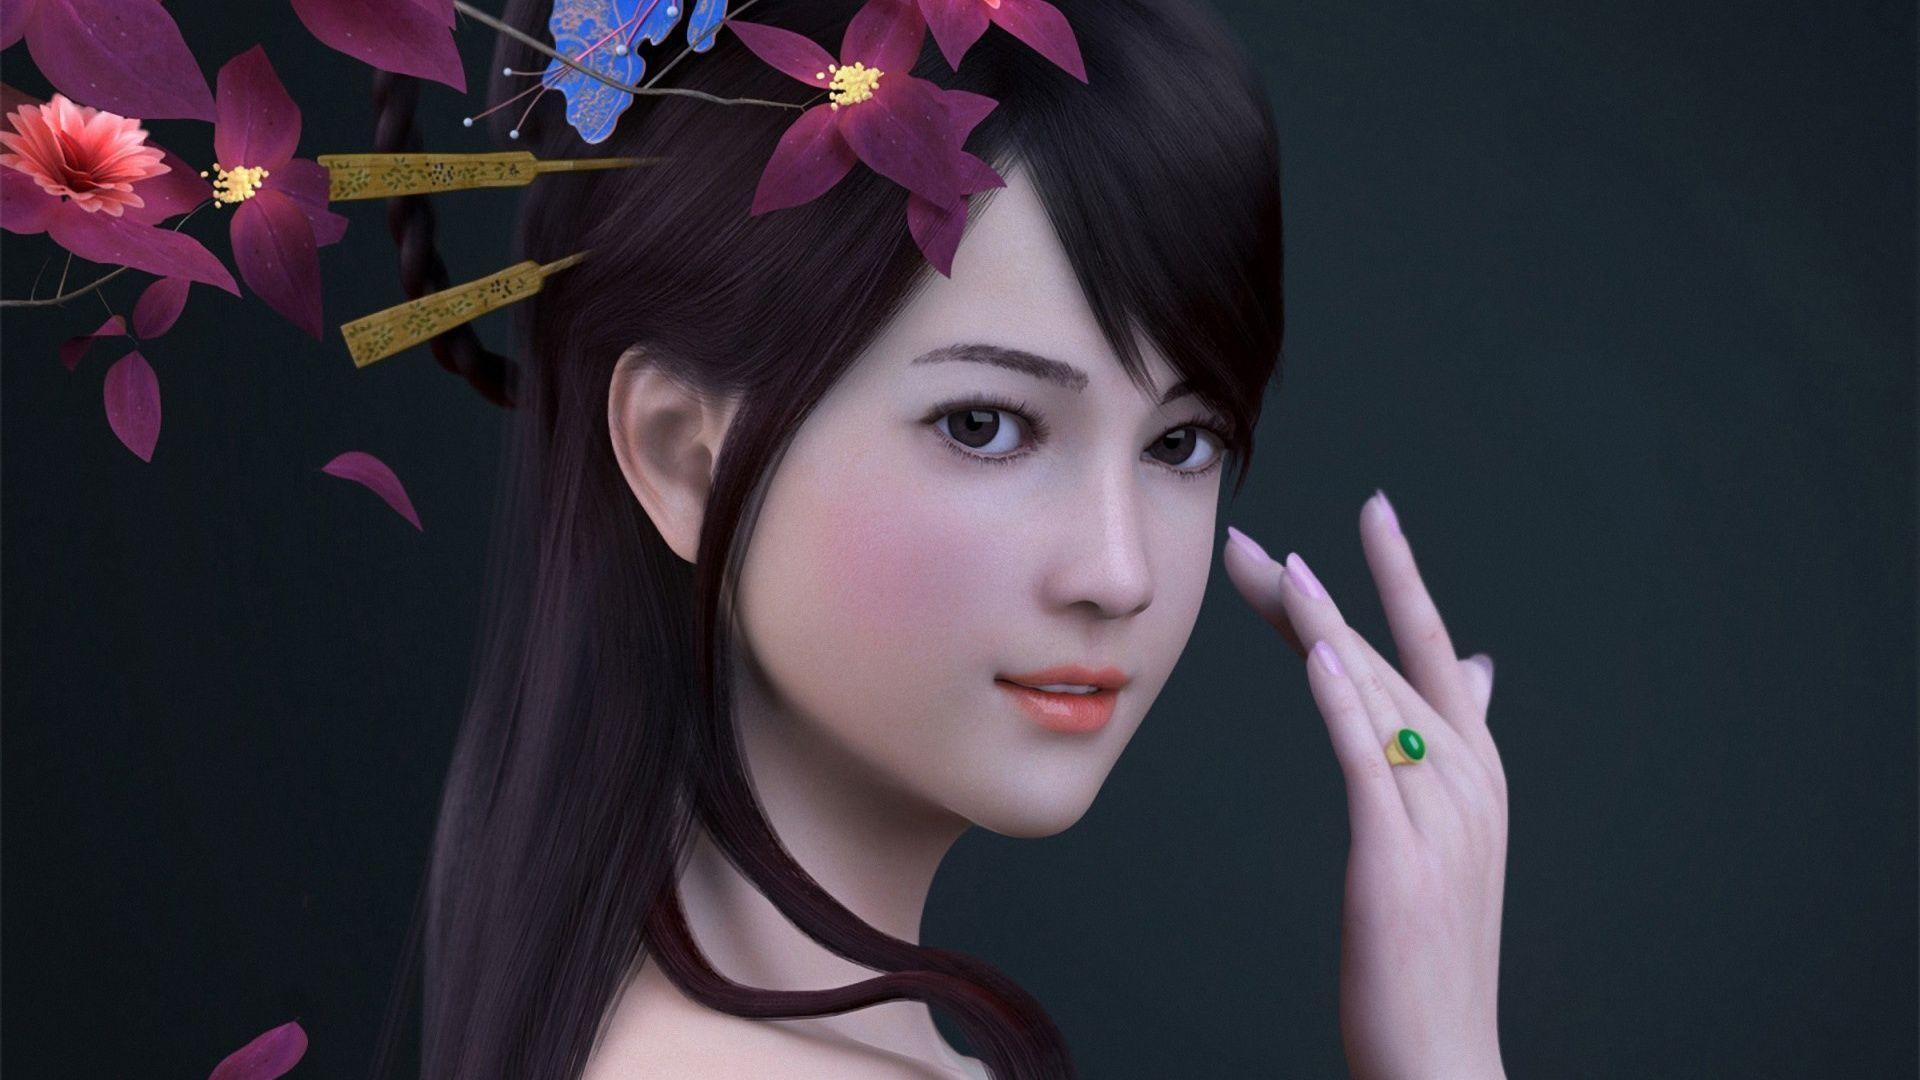 3D Girl Free Desktop Wallpaper